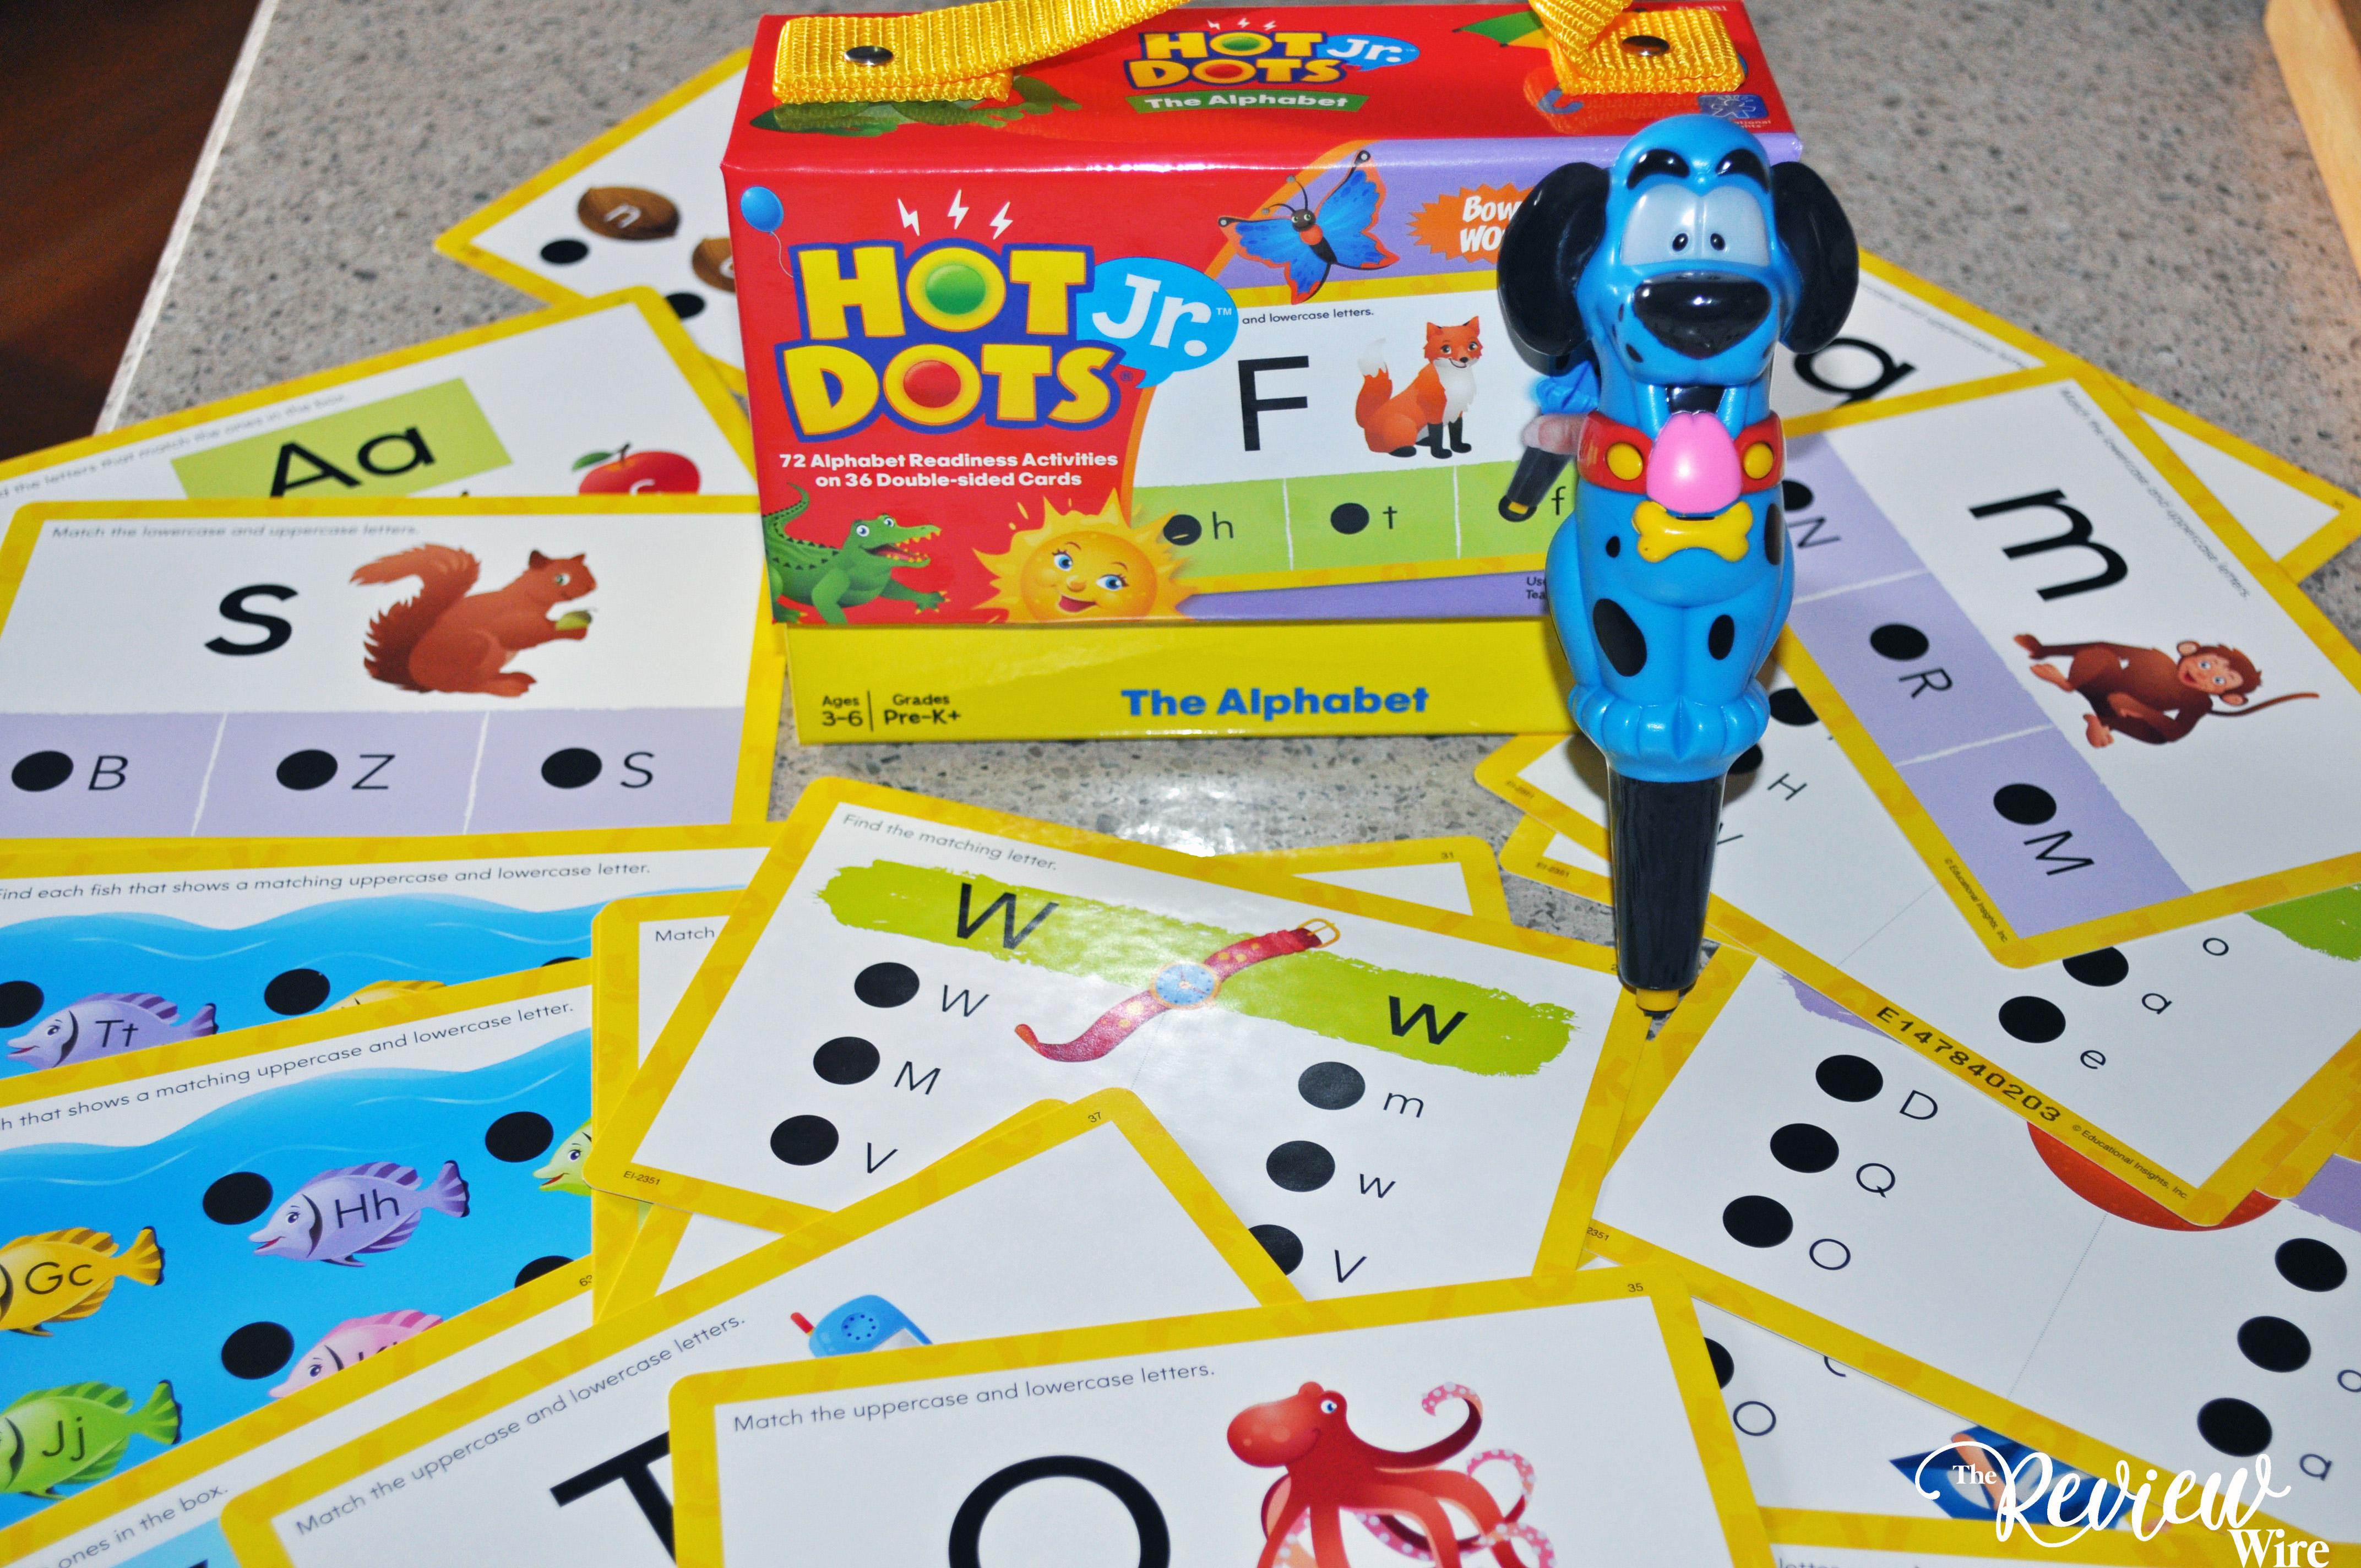 Hot Dots Jr. The Alphabet